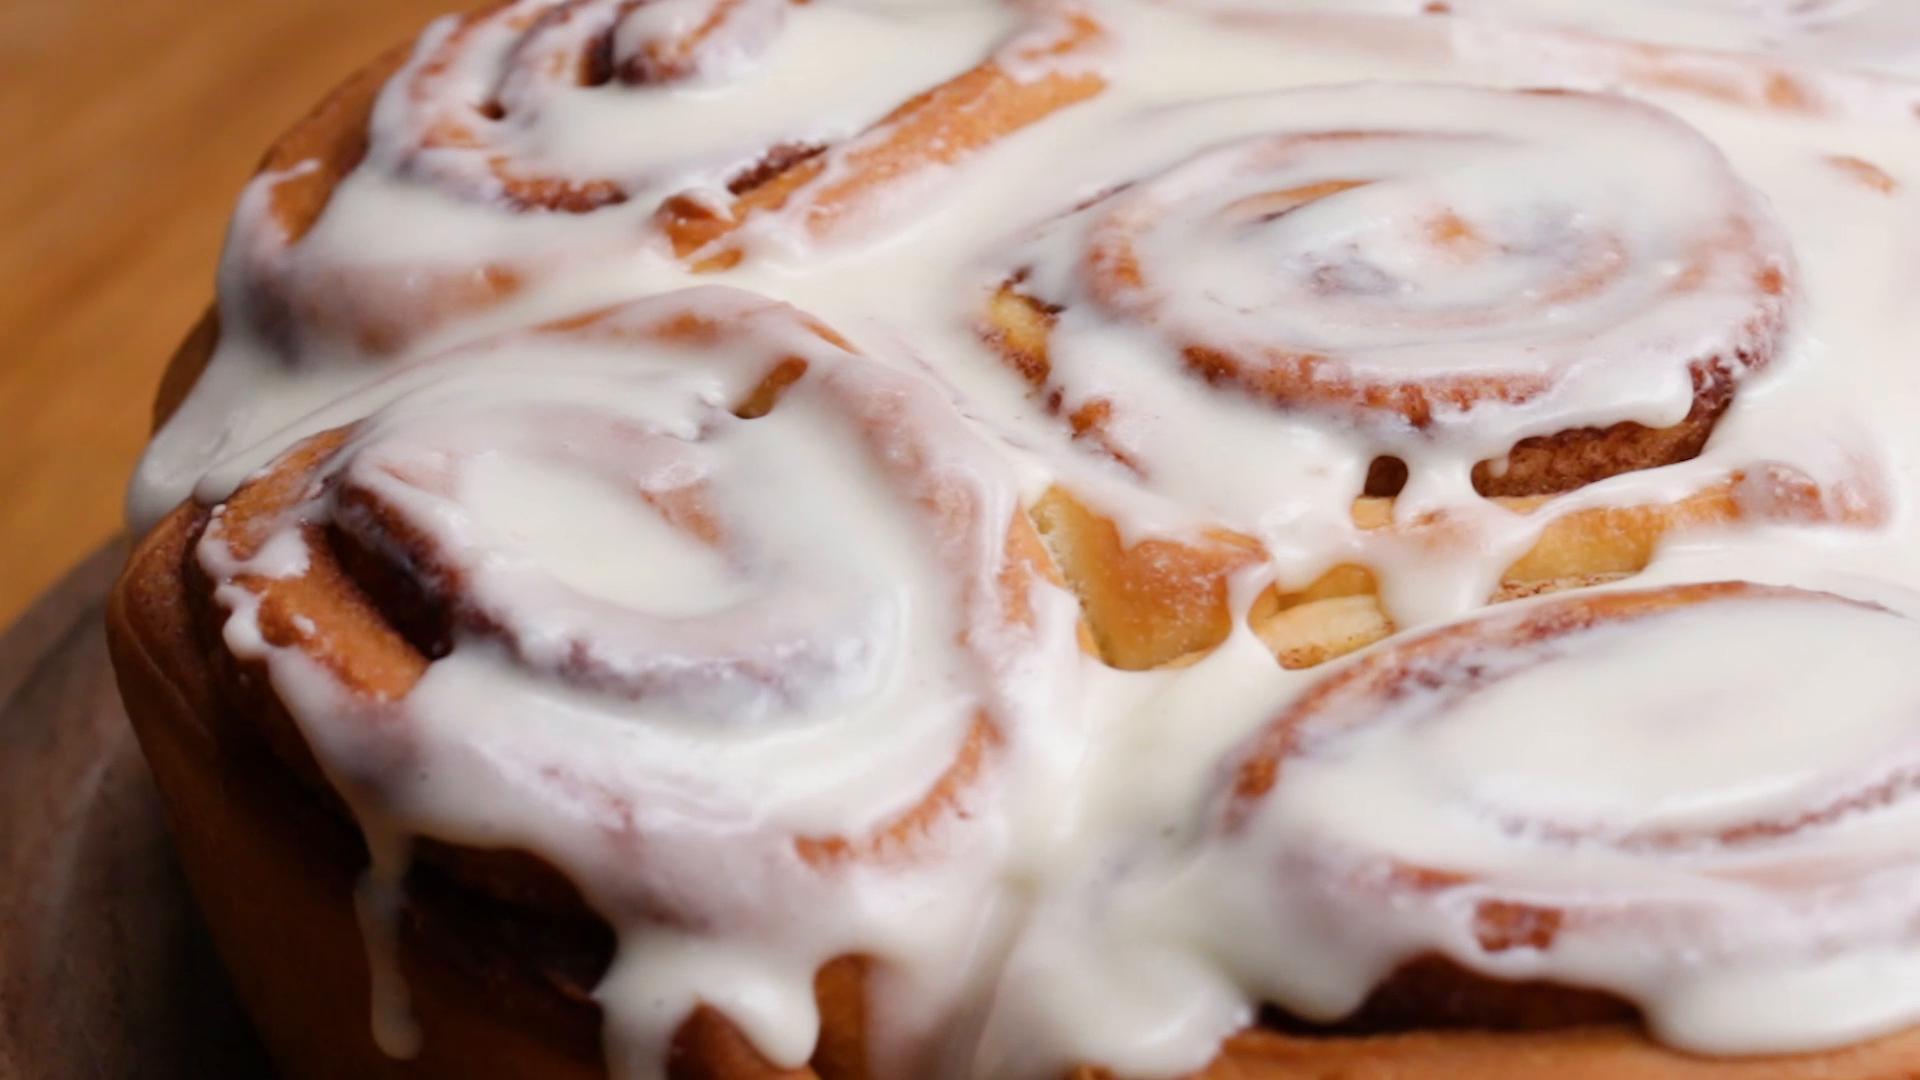 Copycat Cinnabon's Cinnamon Roll Recipe